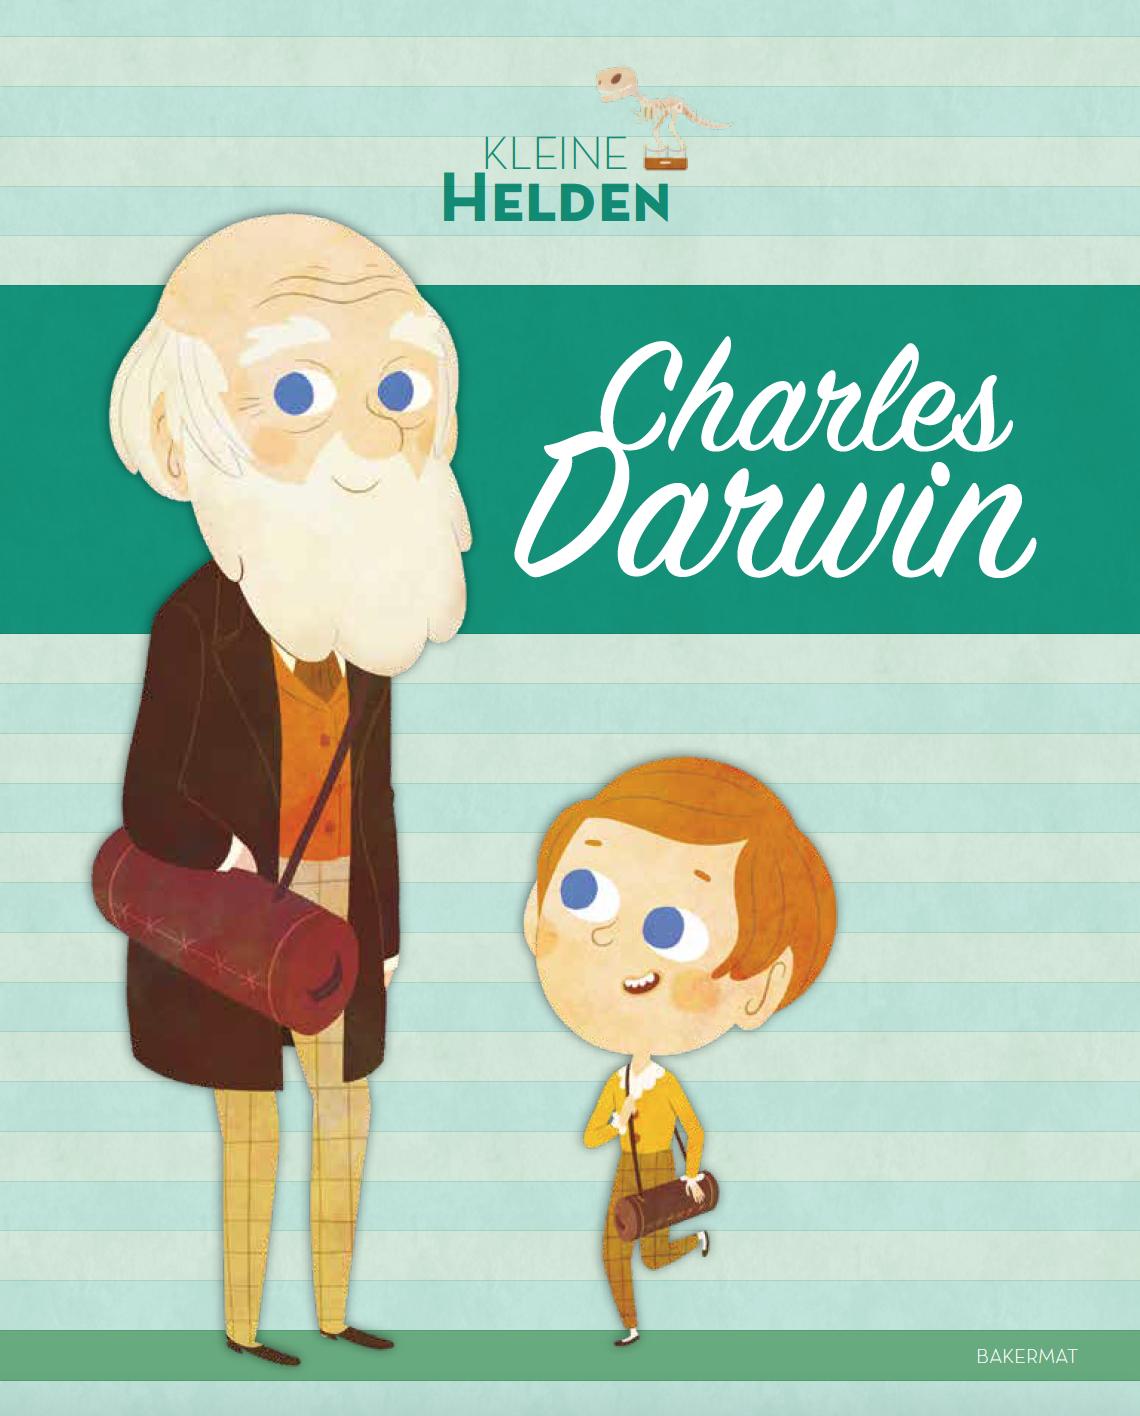 Charles Darwin cover